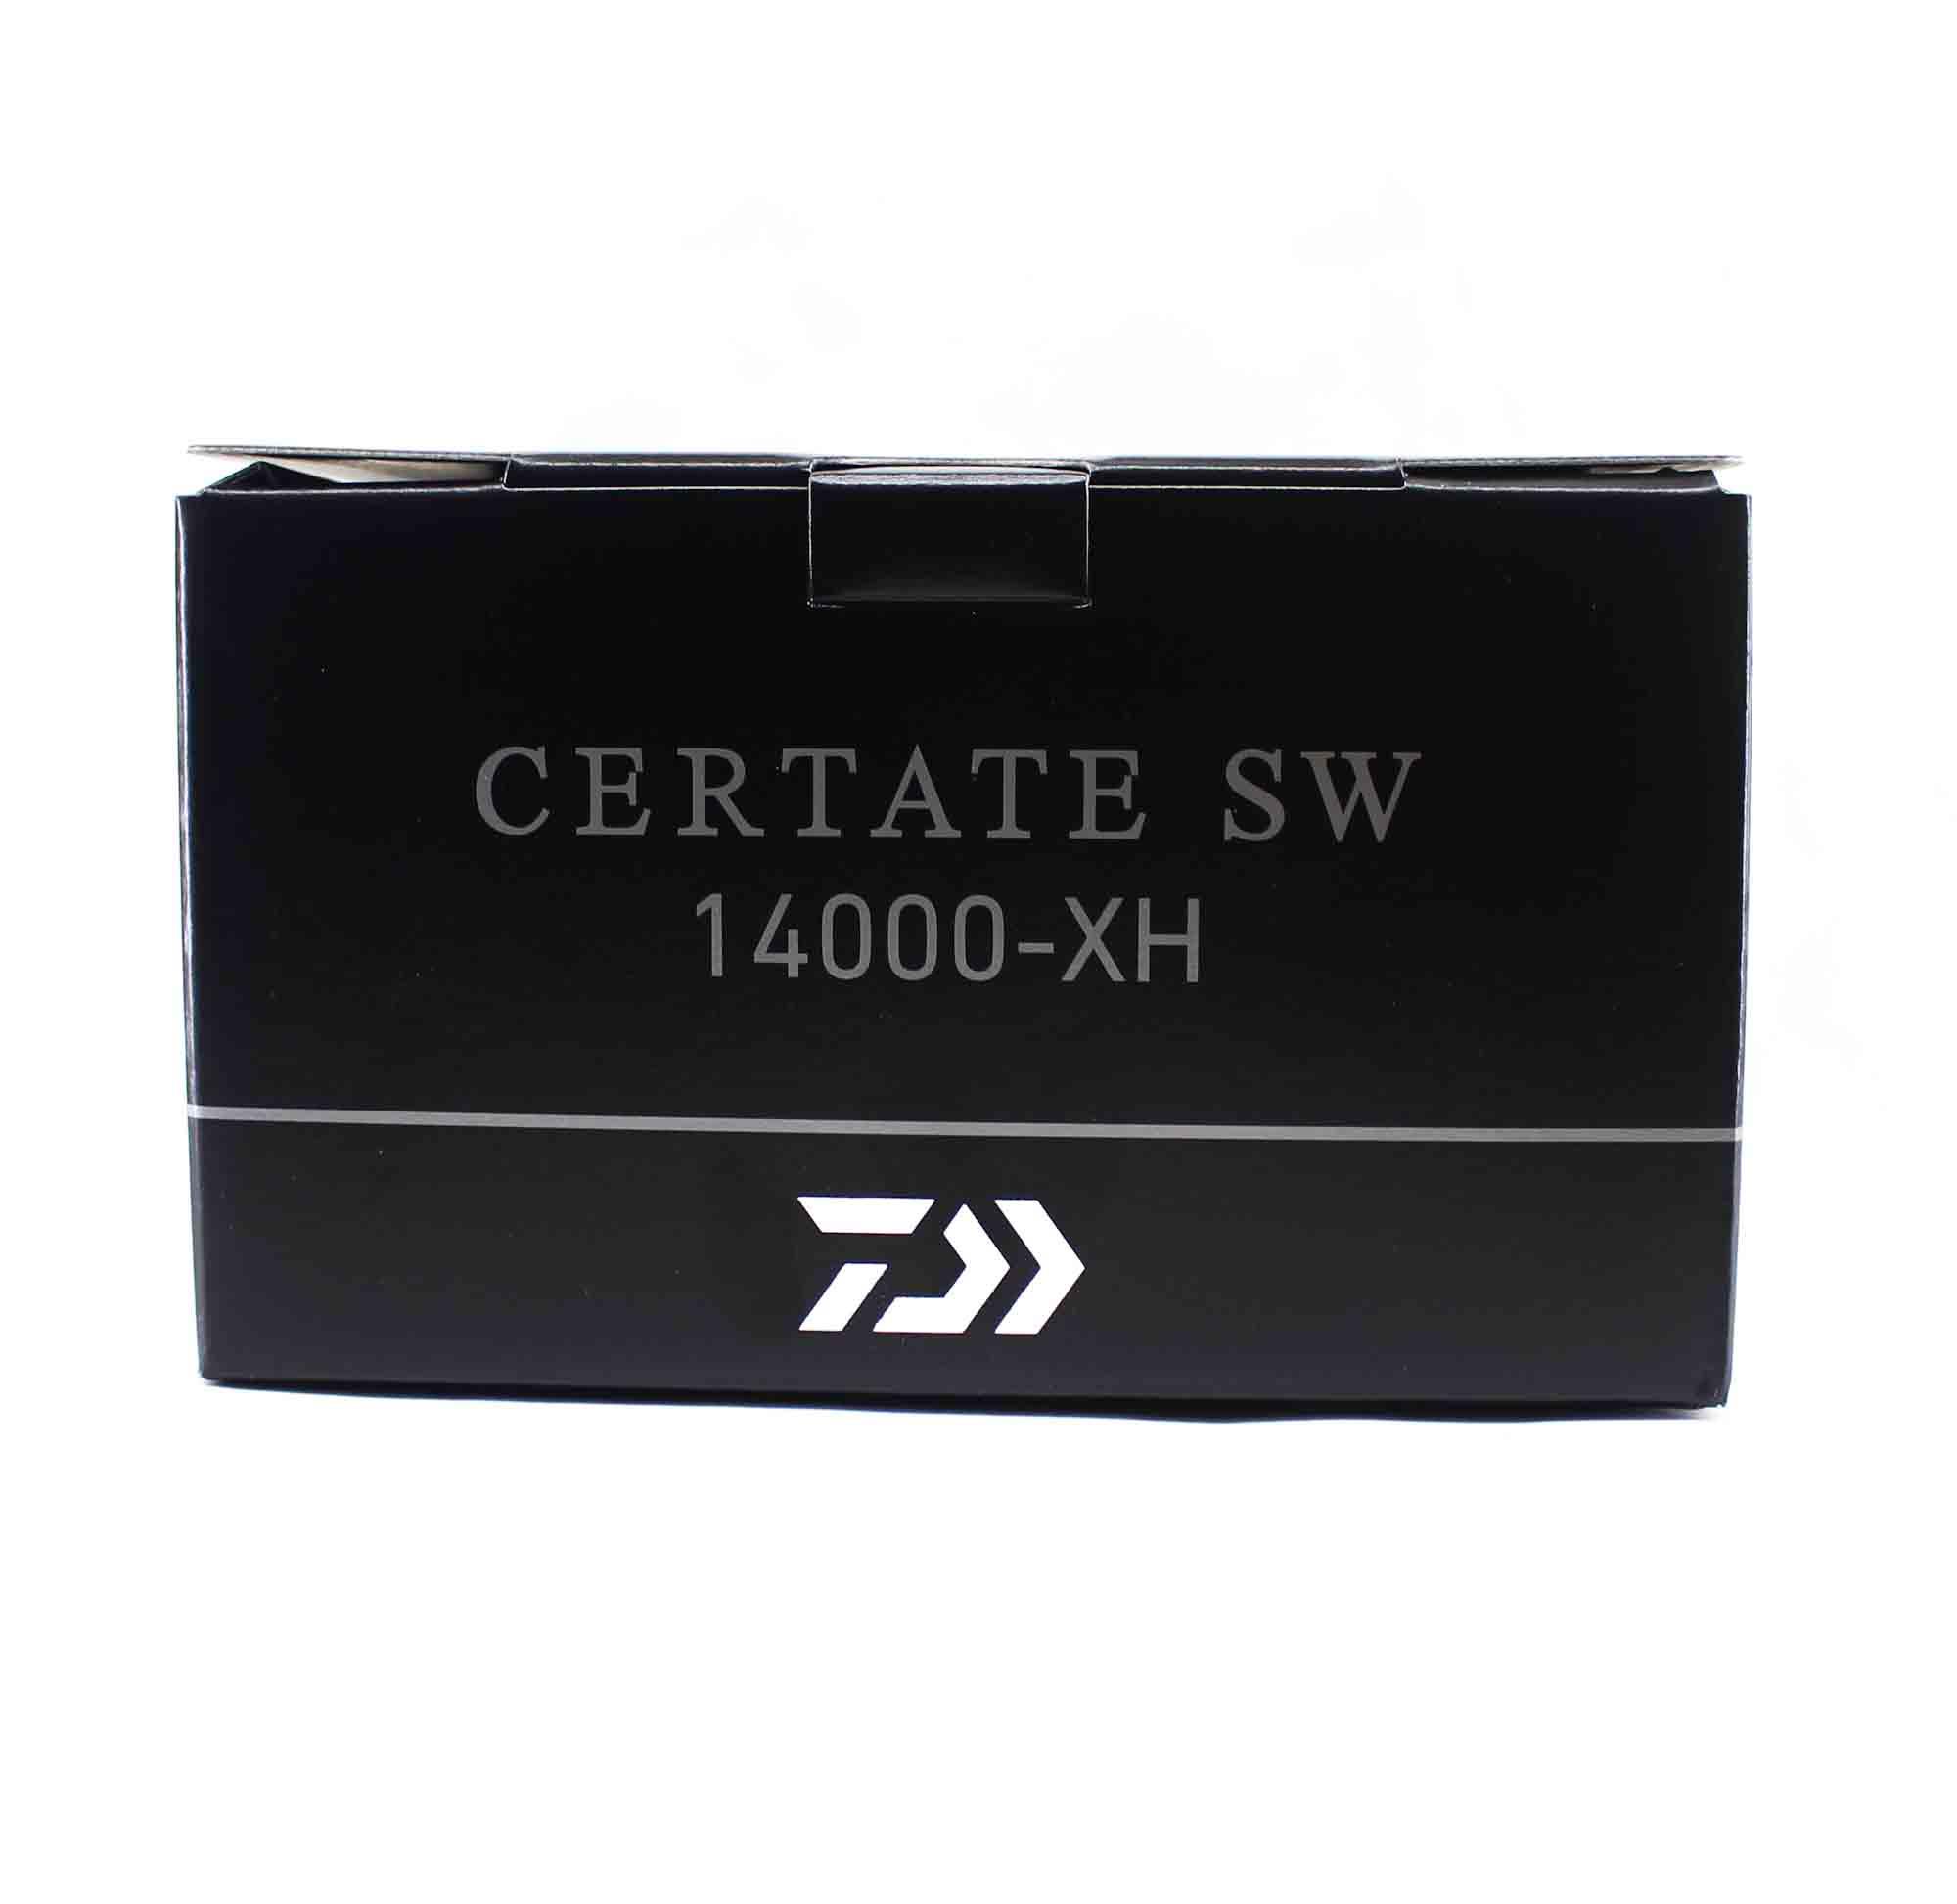 Daiwa Reel Spinning 21 Certate SW 14000-XH (3359)